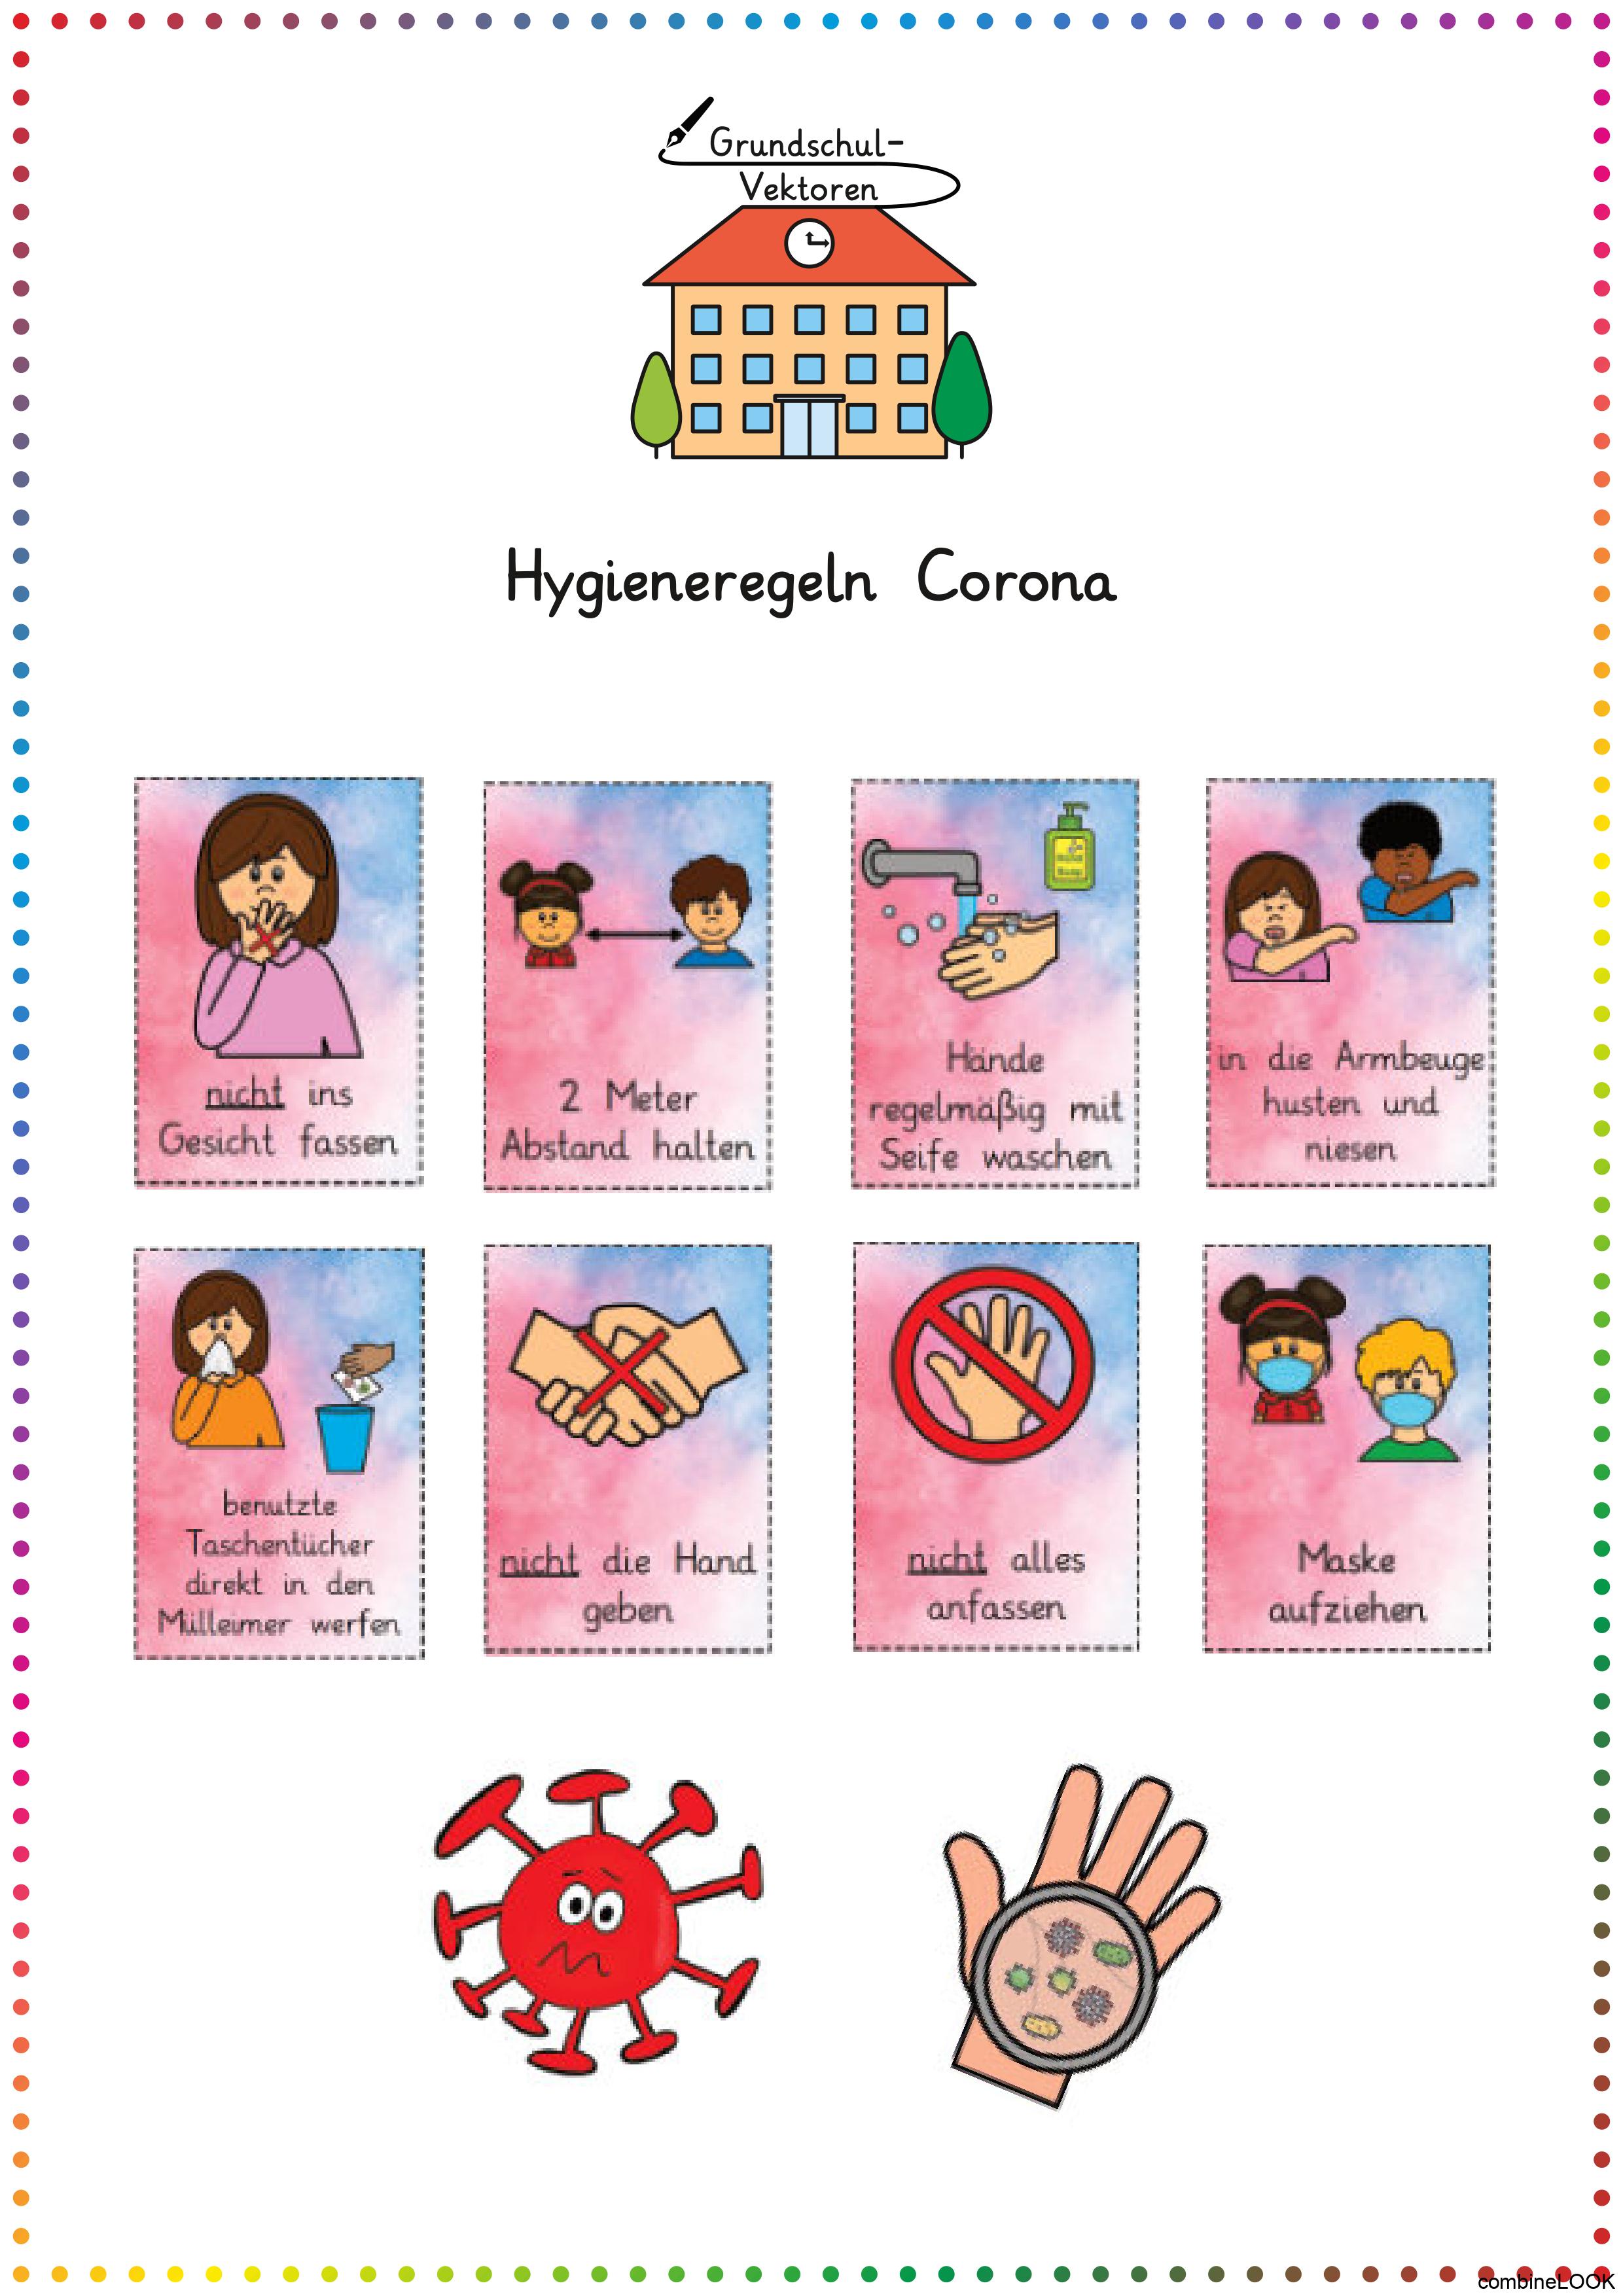 Hygieneregeln Corona Plakate Corona Hygieneregeln Plakate Kindergarten Portfolio Kindergarten Corona